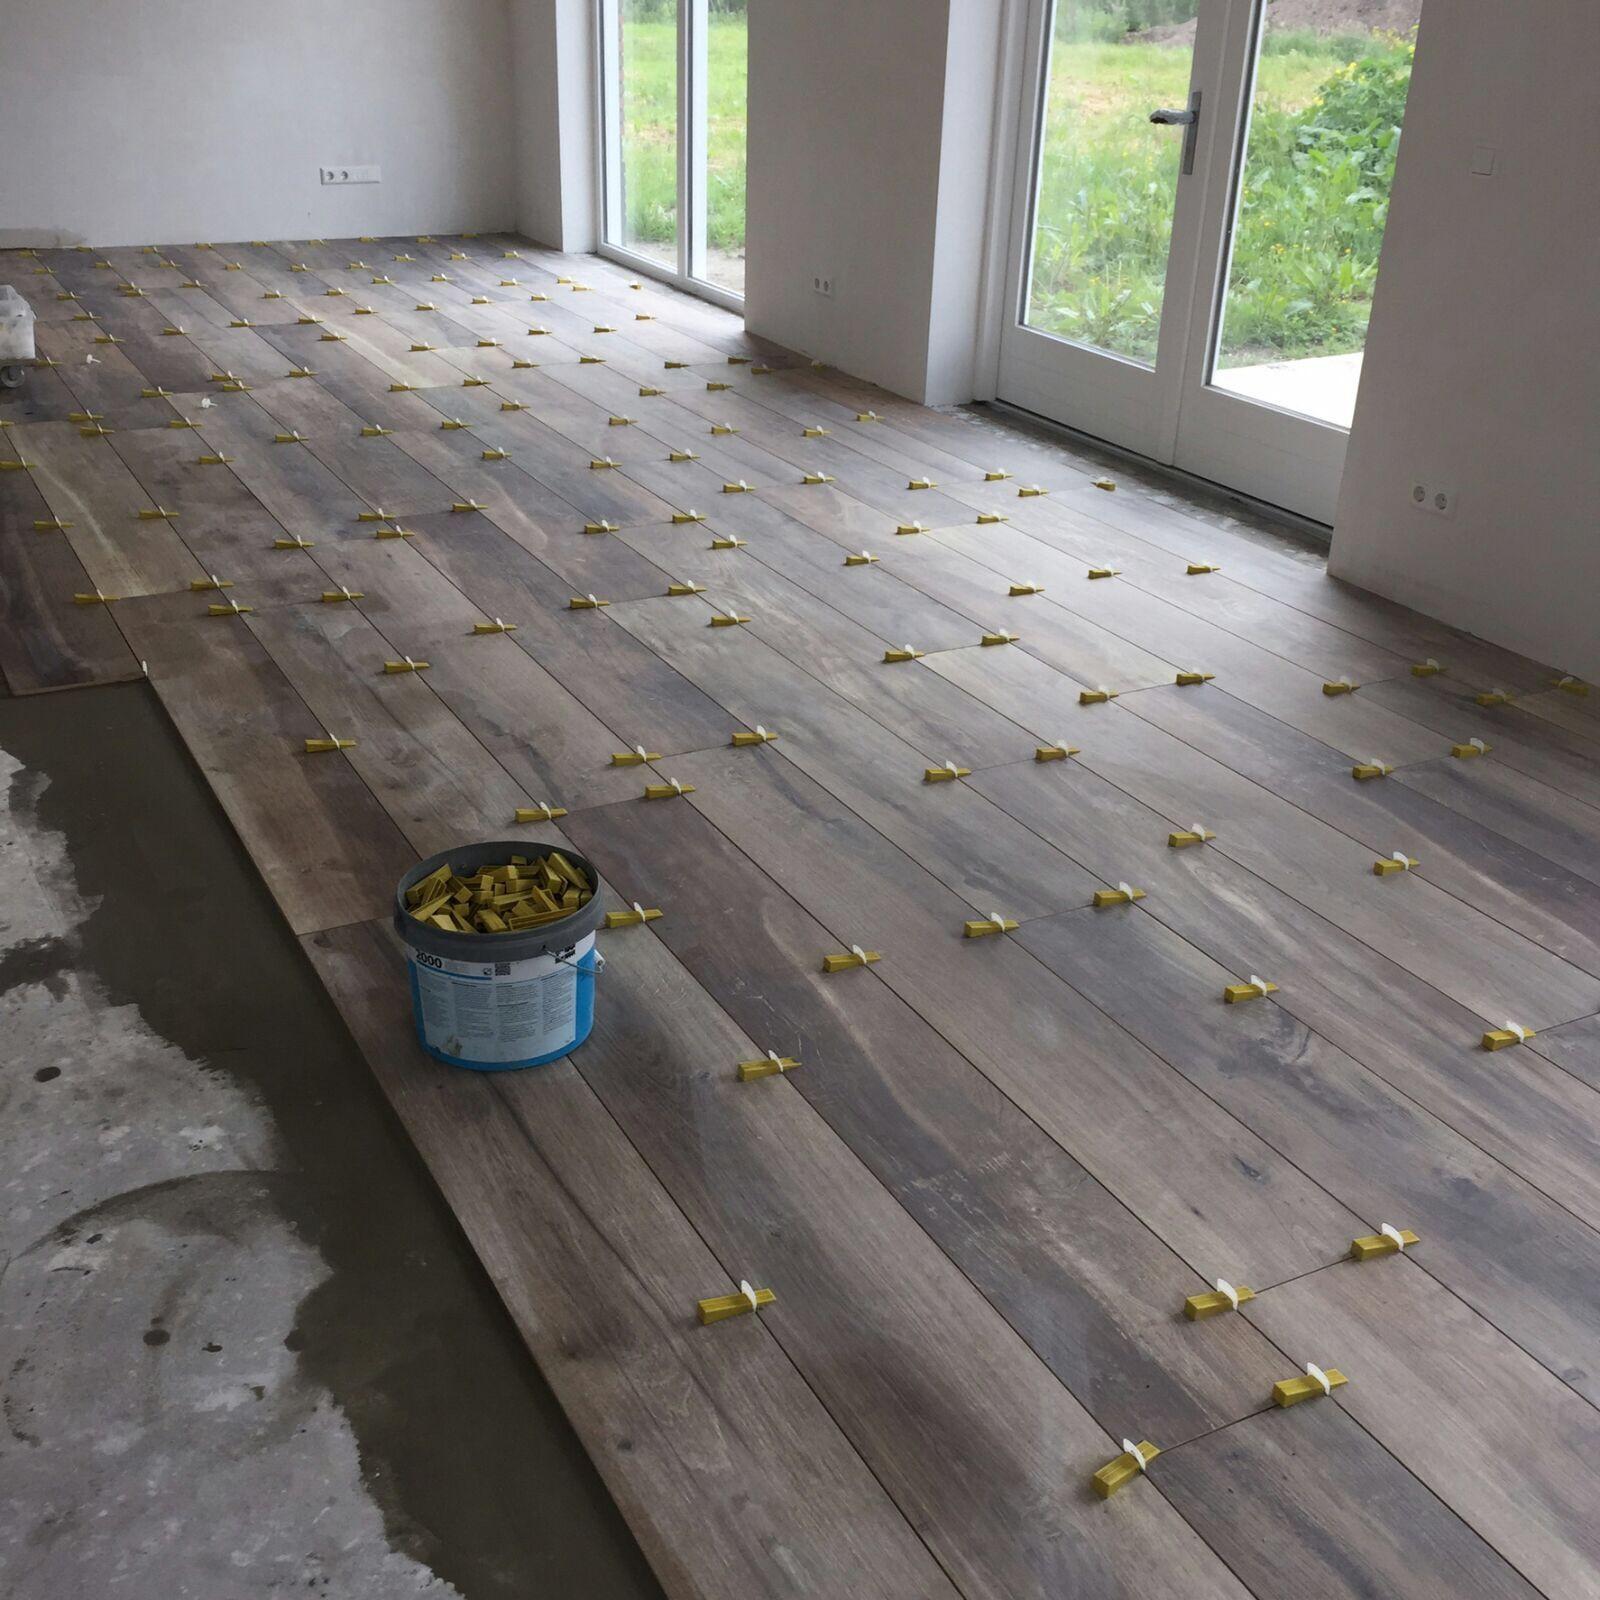 bamboo vs hardwood flooring resale value of keramisch parket tegels kronos woodside oak remodel house harvey for keramisch parket tegels kronos woodside oak